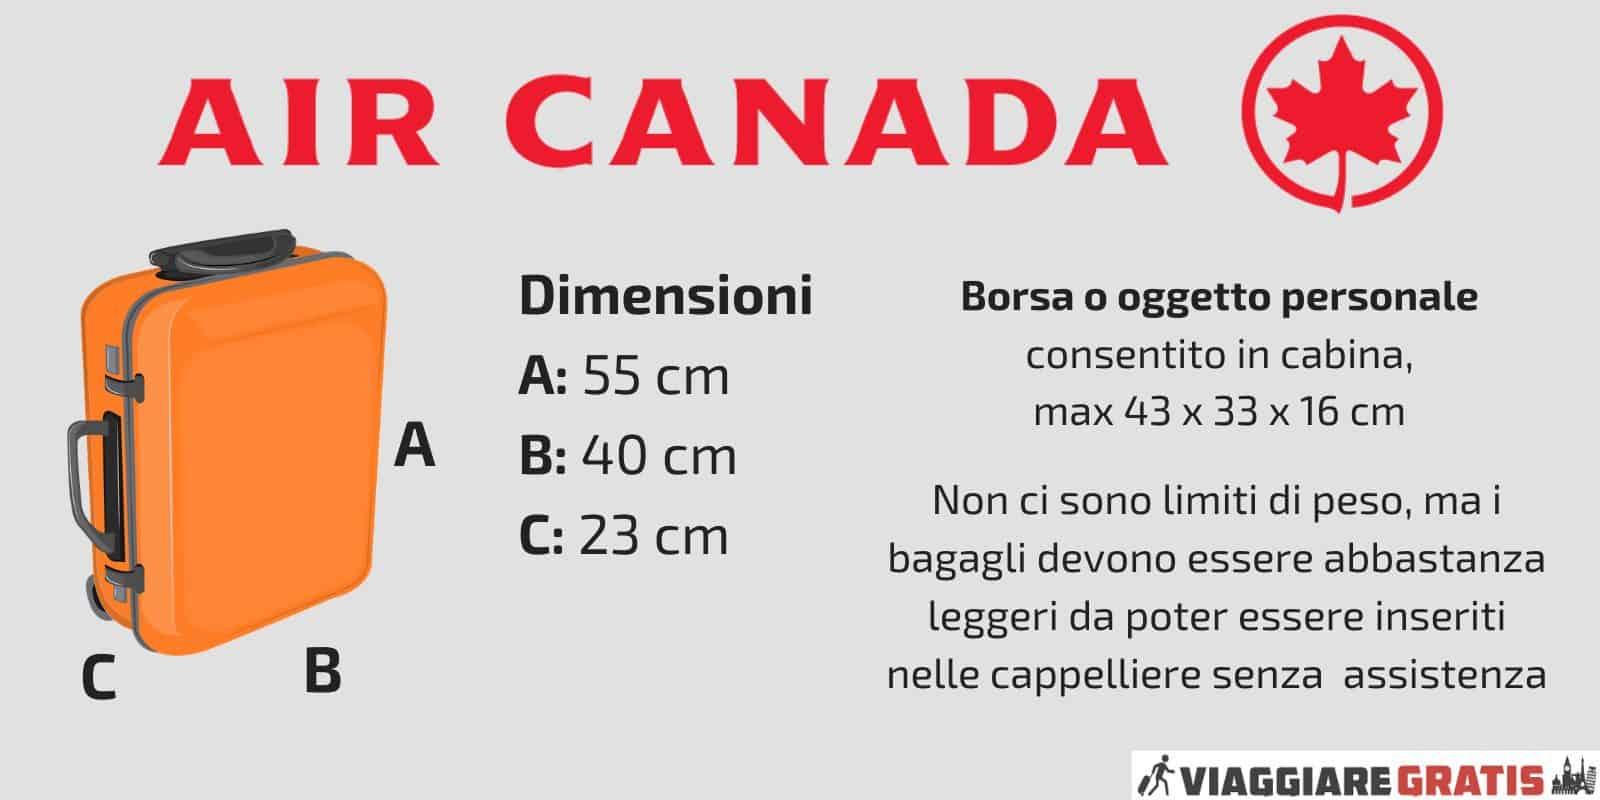 Bagaglio a Mano Air Canada